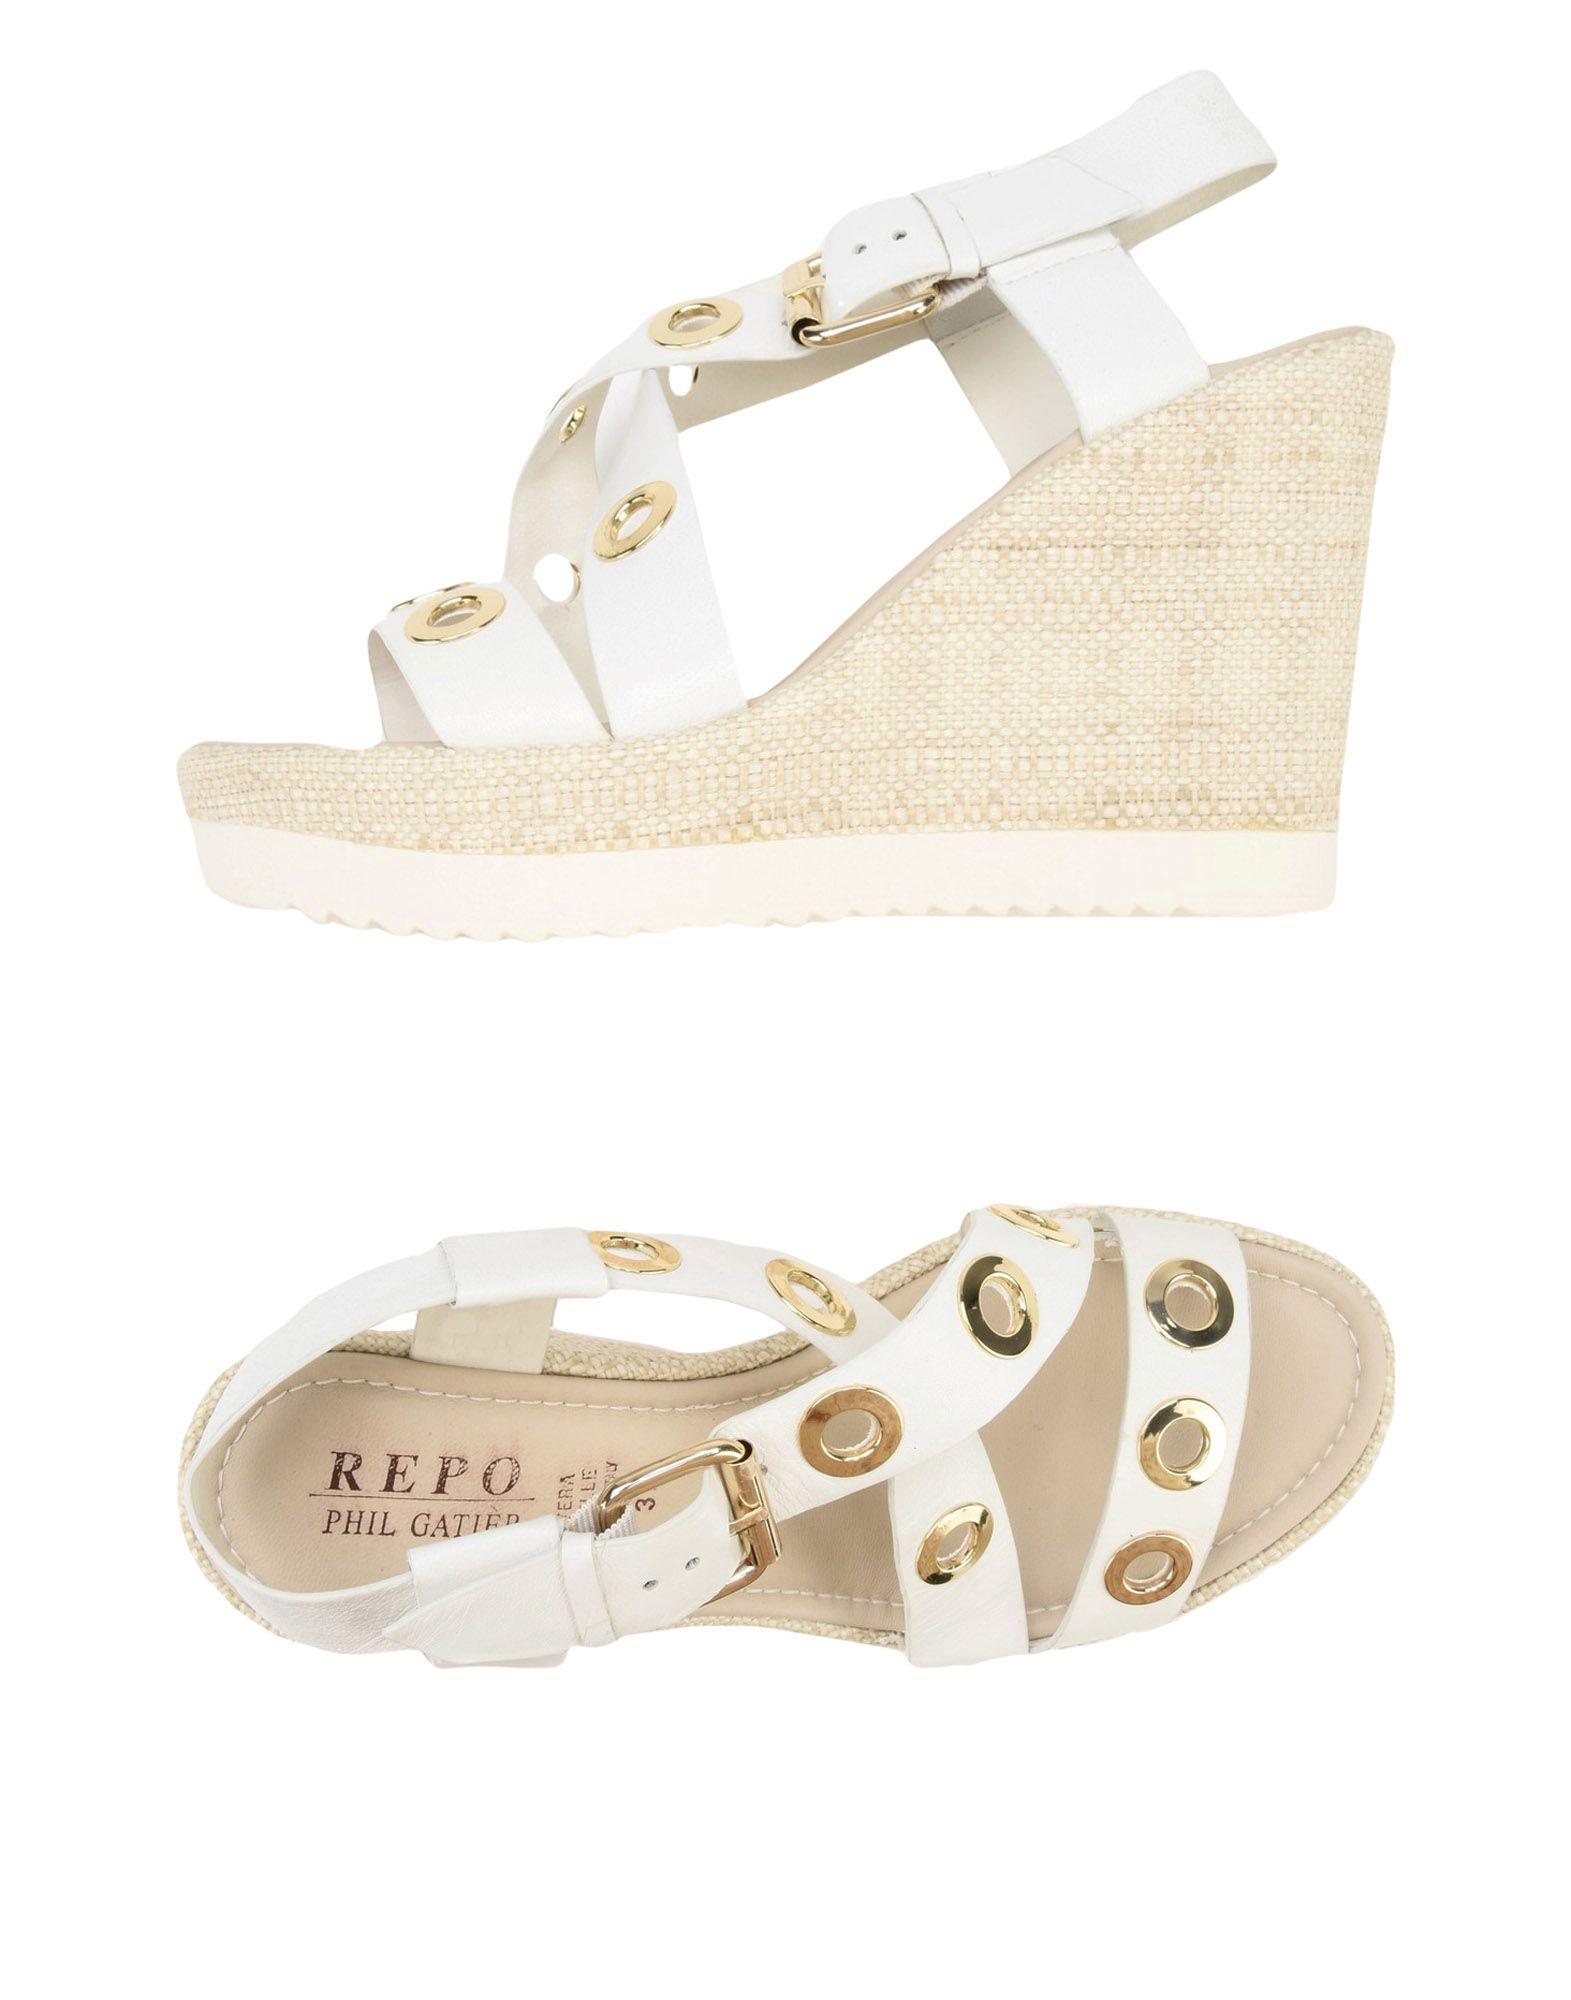 Phil Gatièr Gute By Repo Sandalen Damen 11394972RF Gute Gatièr Qualität beliebte Schuhe f6b998